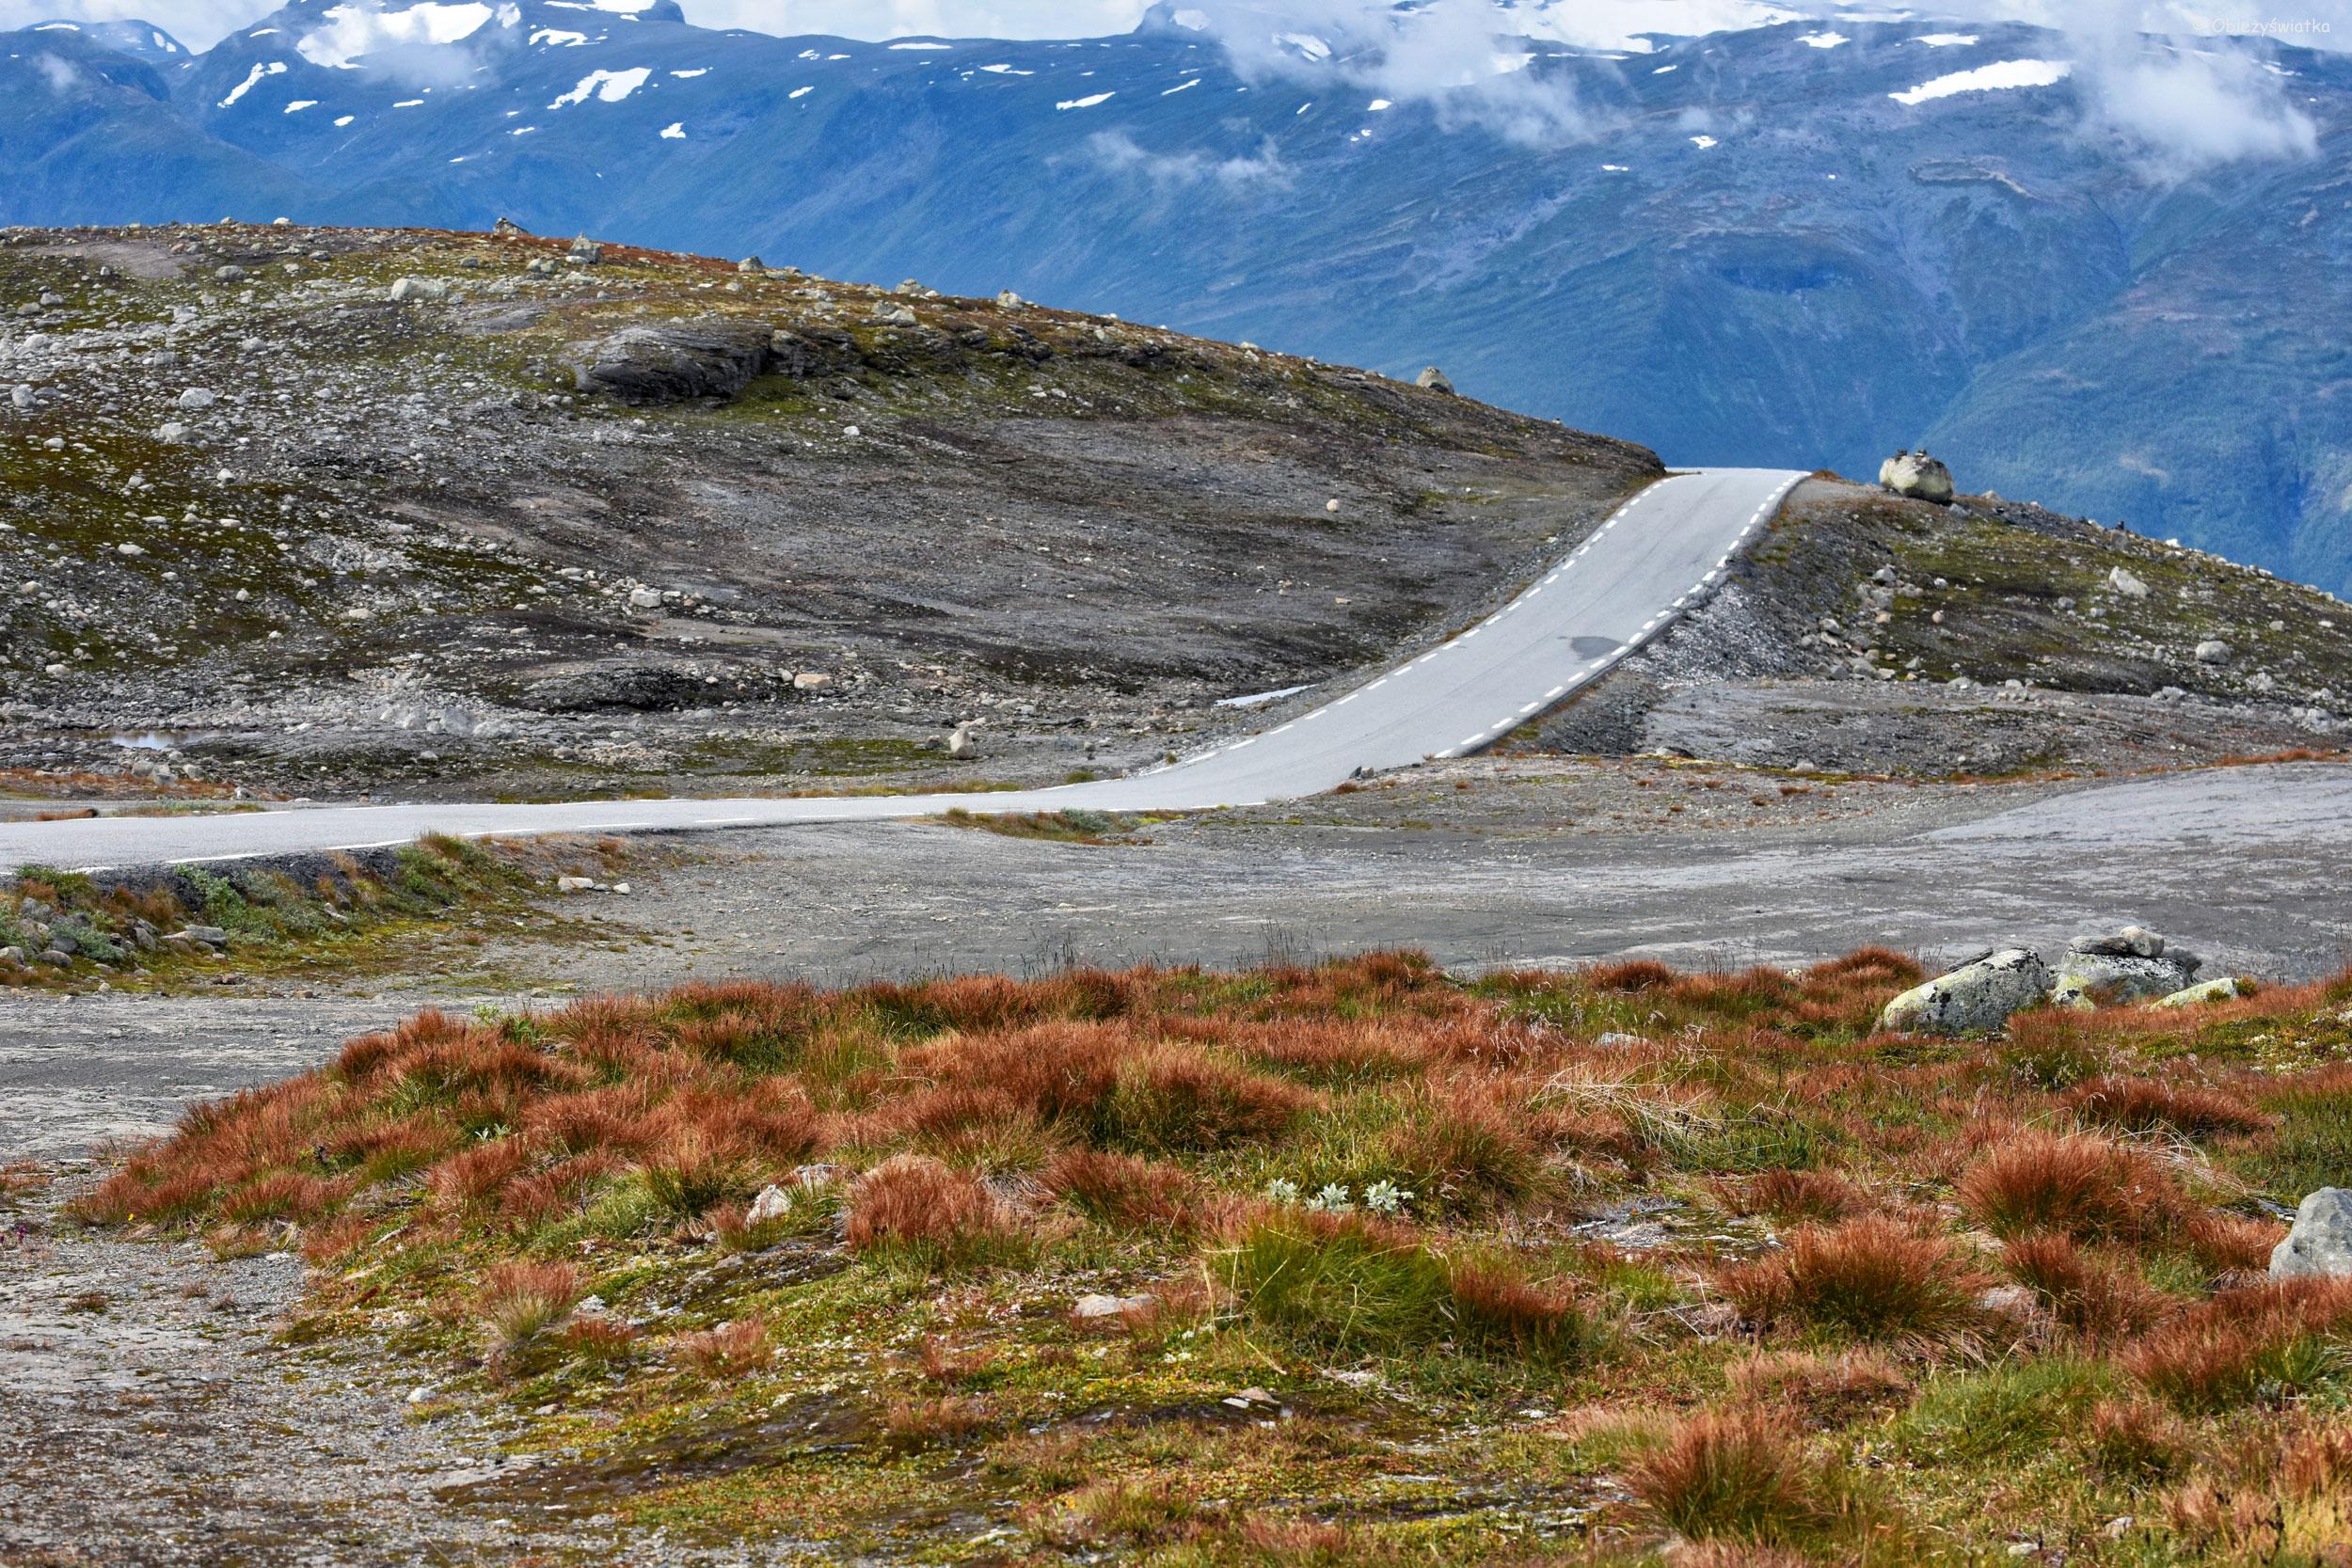 Samotne drogi, Aurlandsfjellet, Norwegia